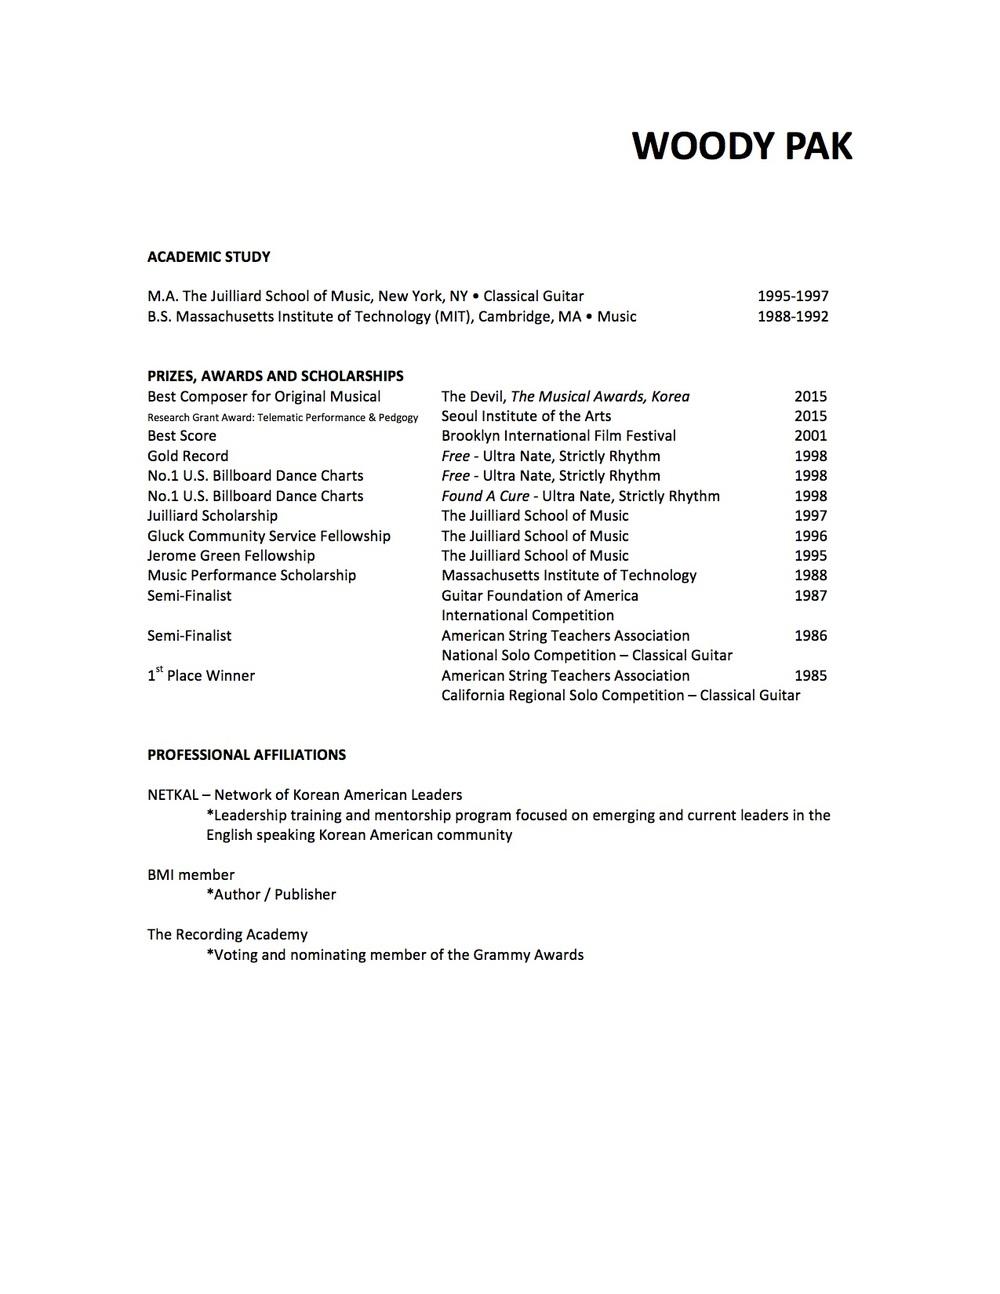 WOODY PAK_CV_2015_2_1.jpg